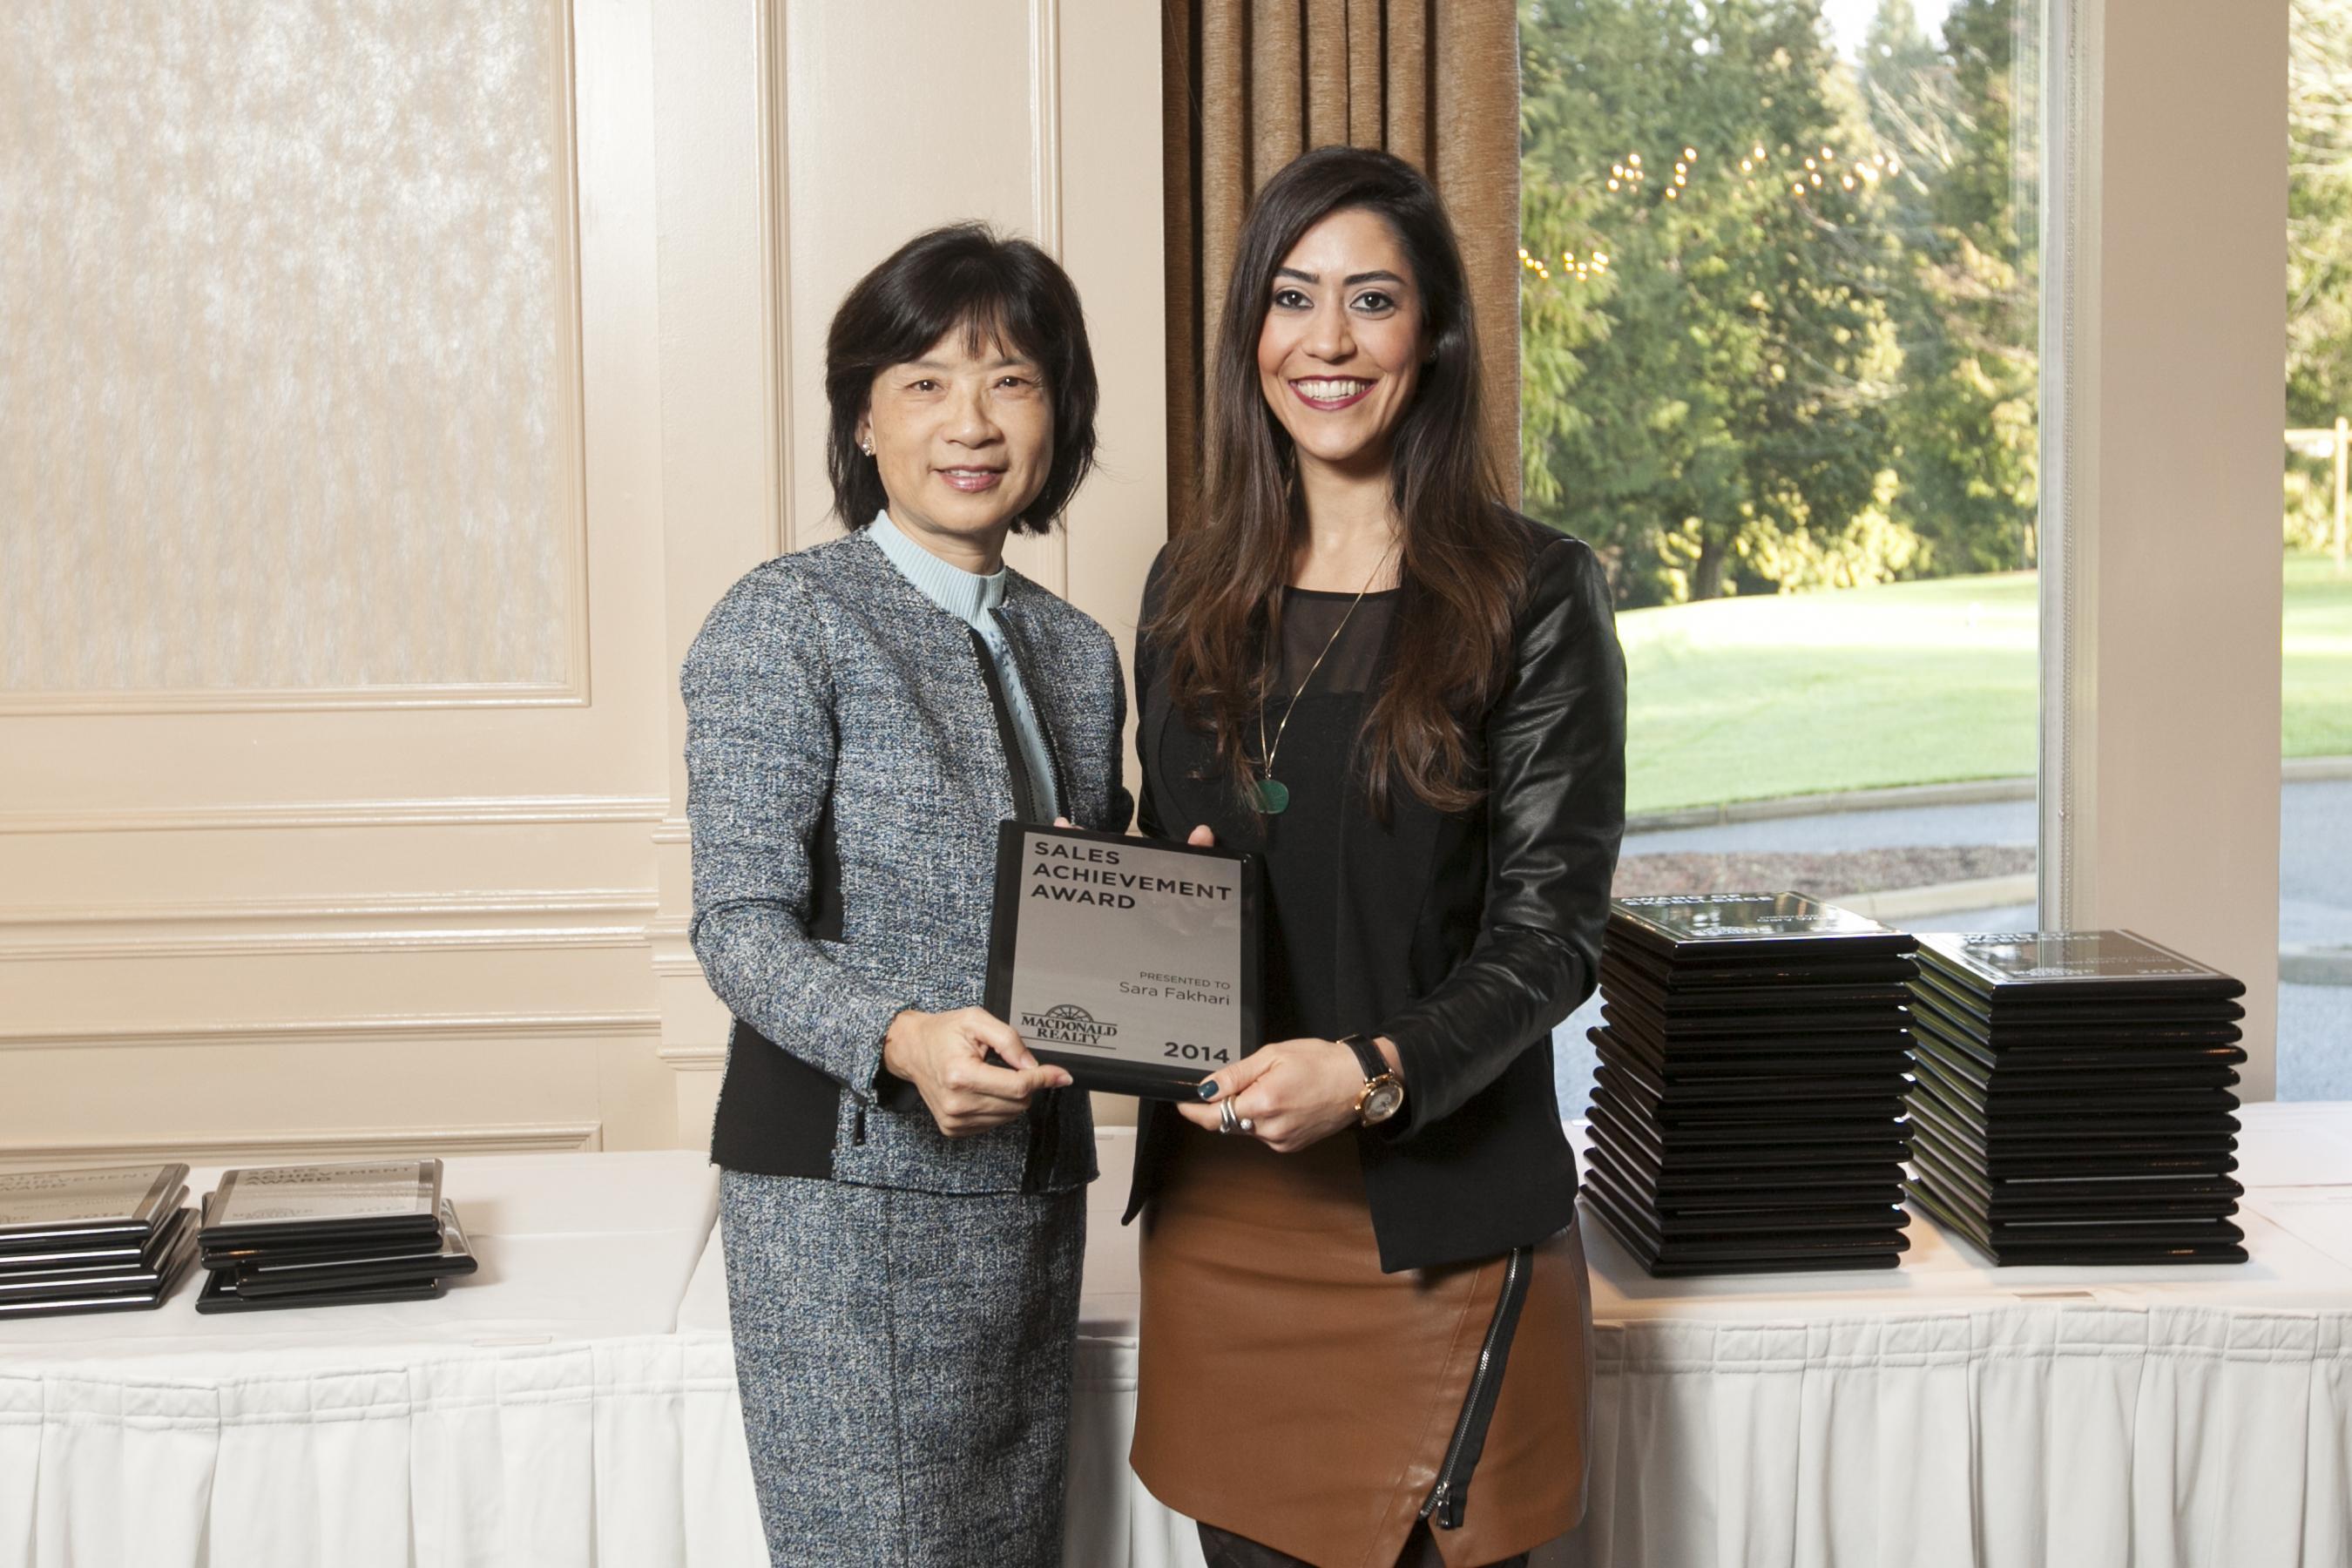 2014 sales achievement award